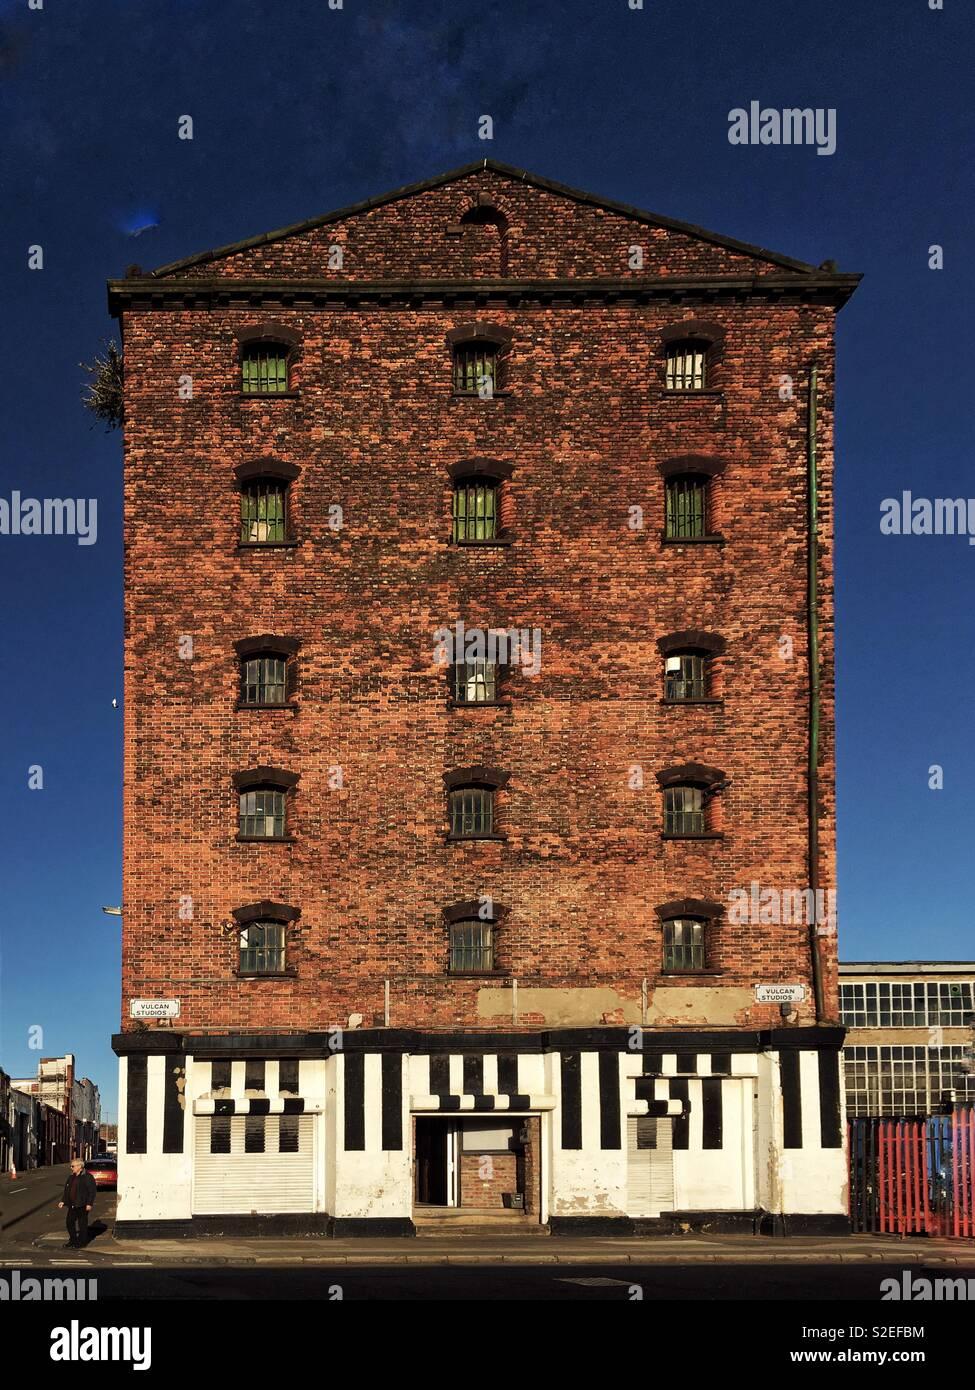 Vulcan Studios, Waterloo Rd, Liverpool - Stock Image